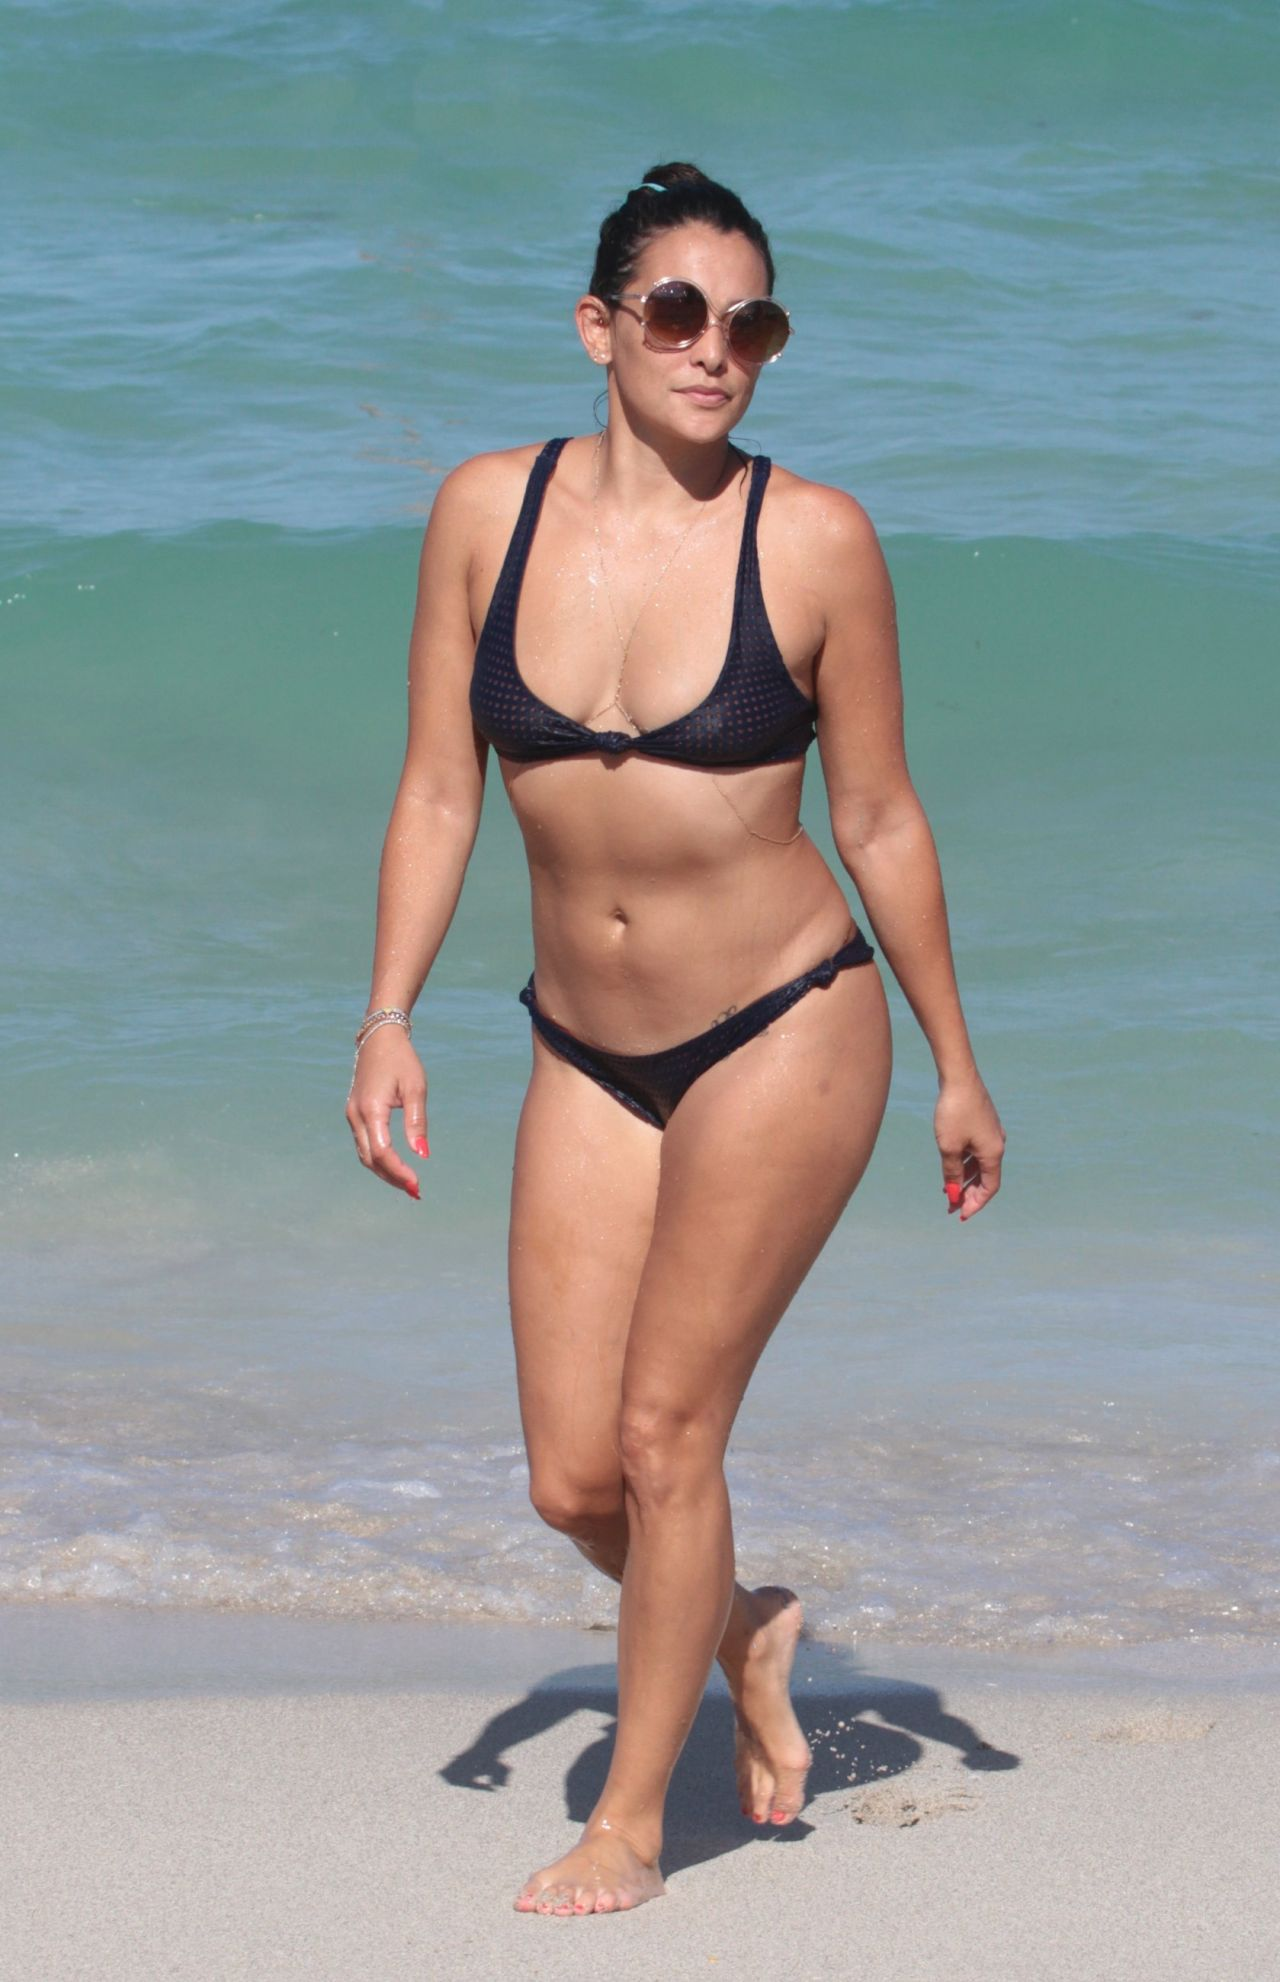 Natalie martinez in bikini miami beach florida new images